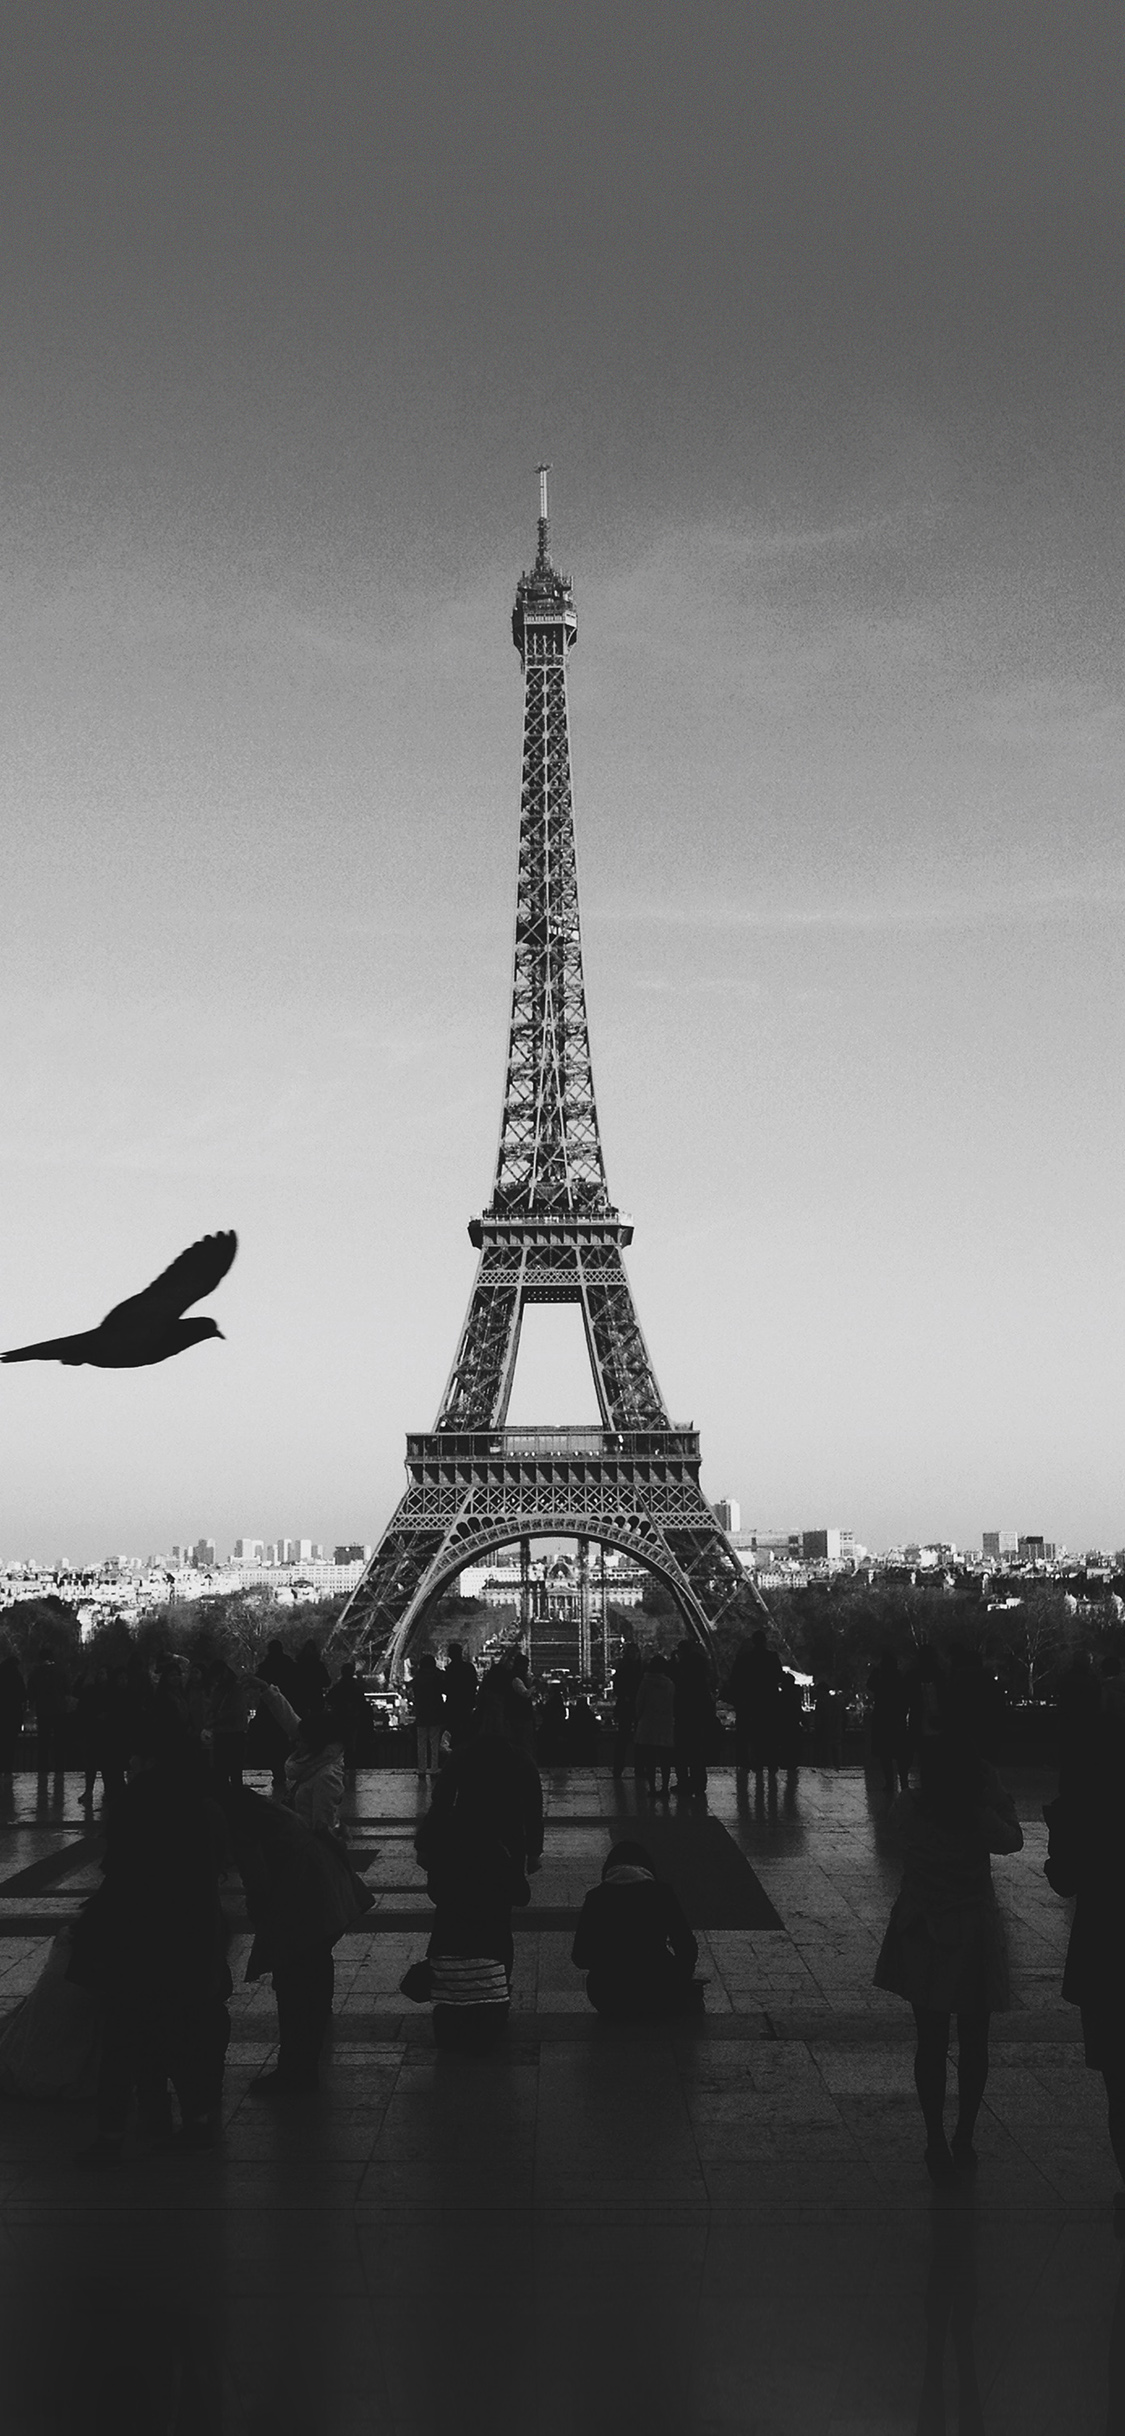 iPhoneXpapers.com-Apple-iPhone-wallpaper-mu80-paris-eiffel-tower-tour-dark-bw-bird-france